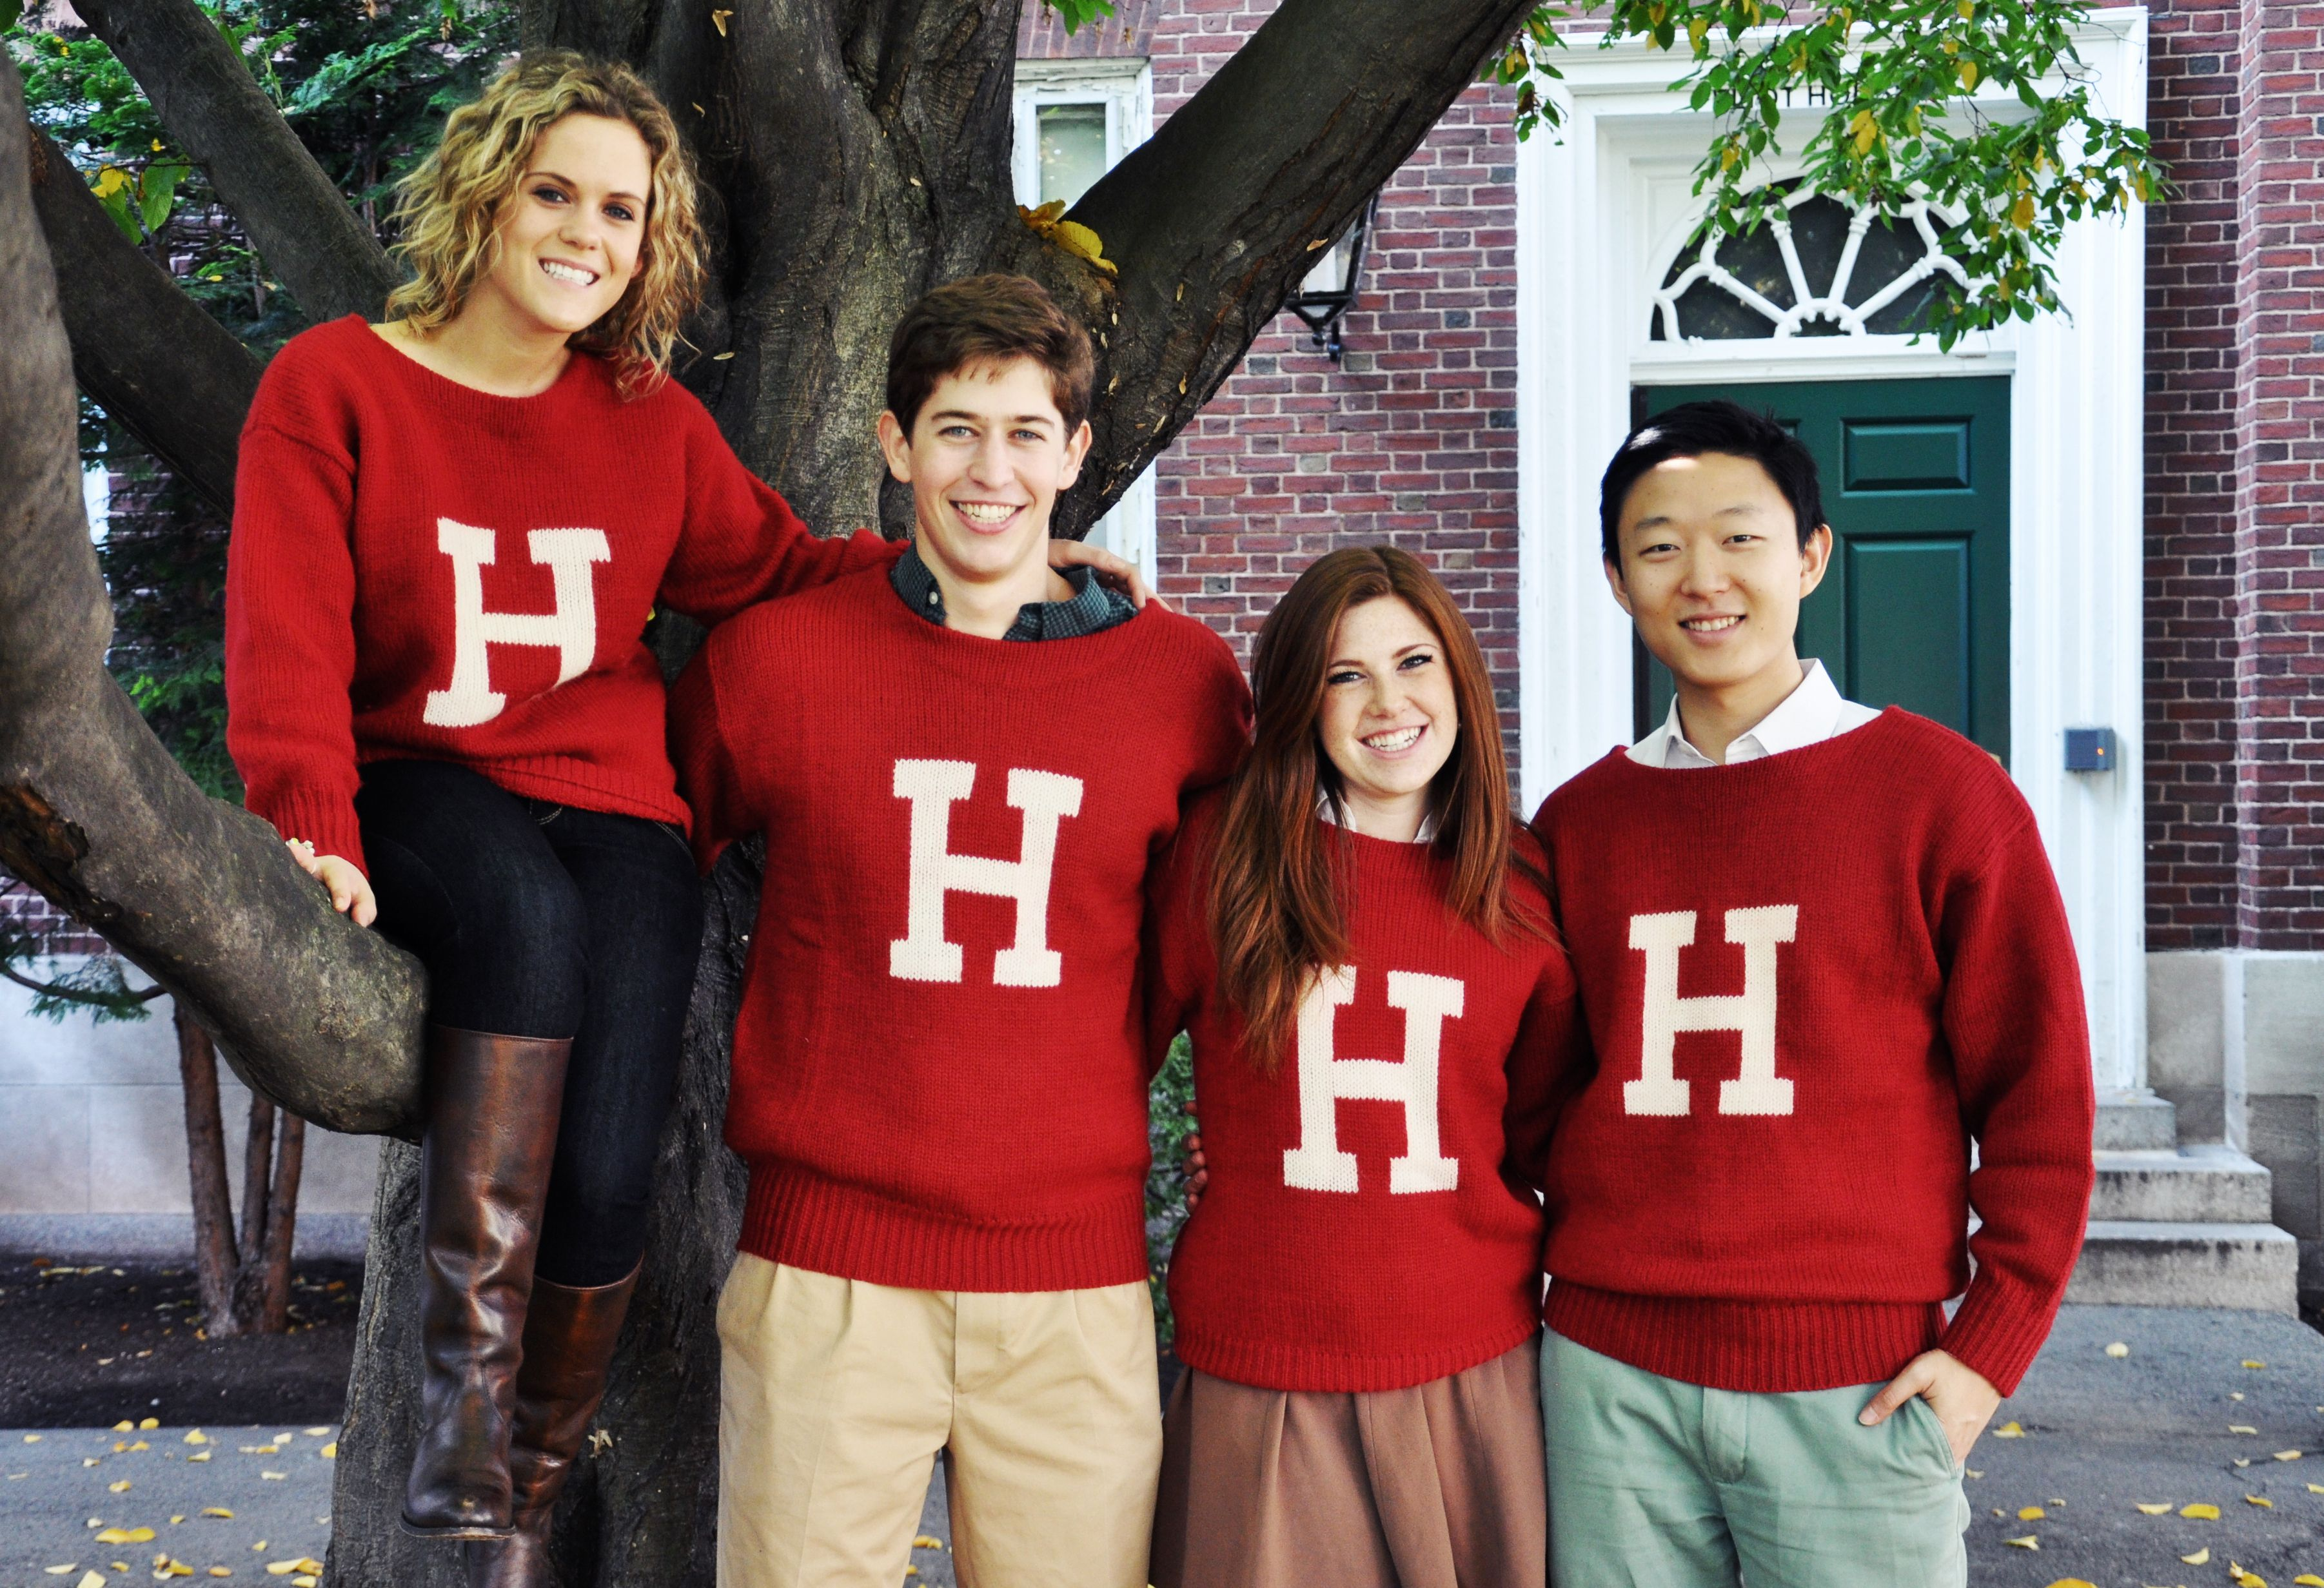 The Harvard H Sweater....